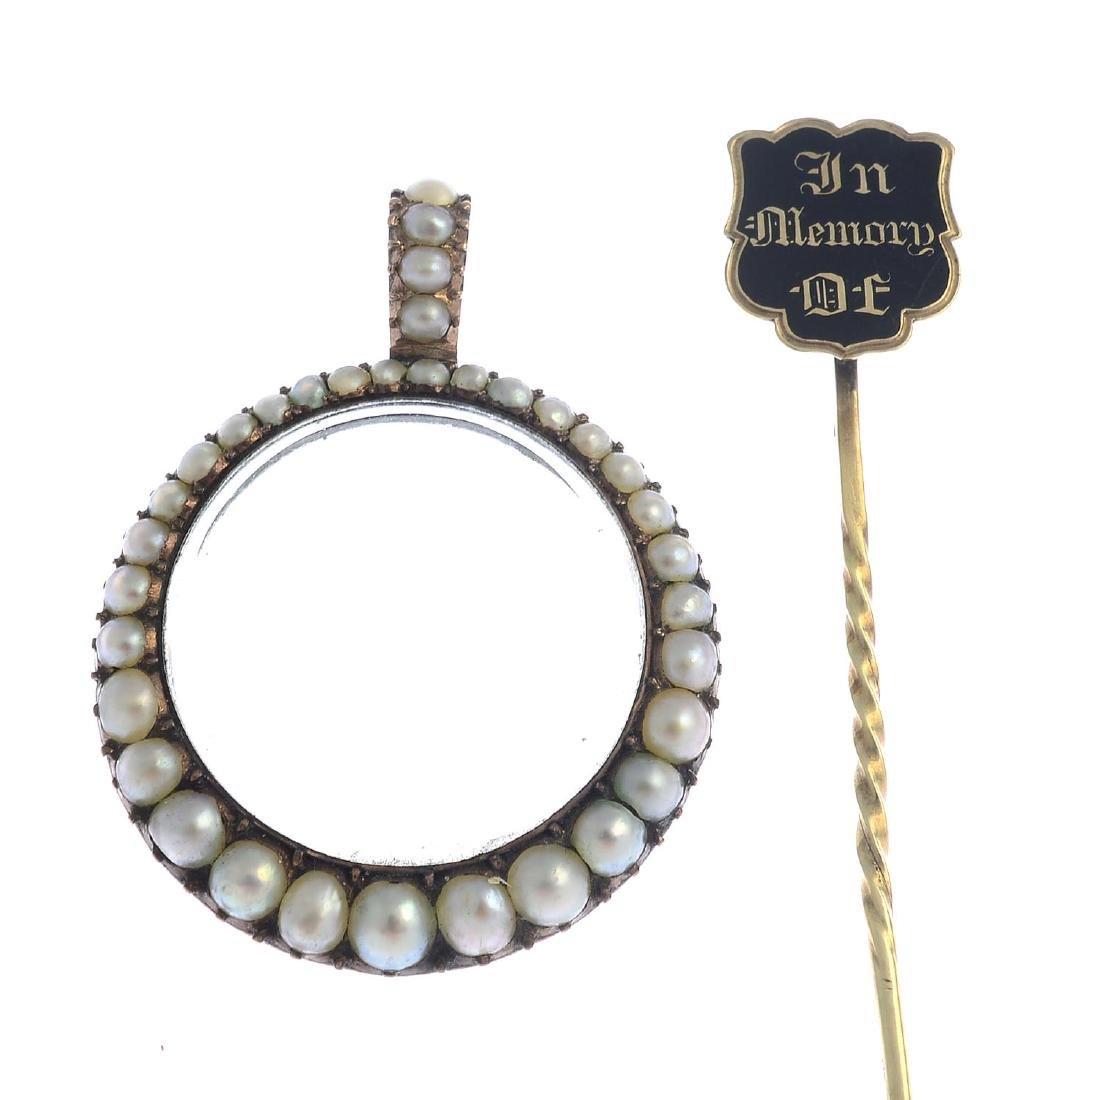 A late Georgian gold split pearl locket, a late